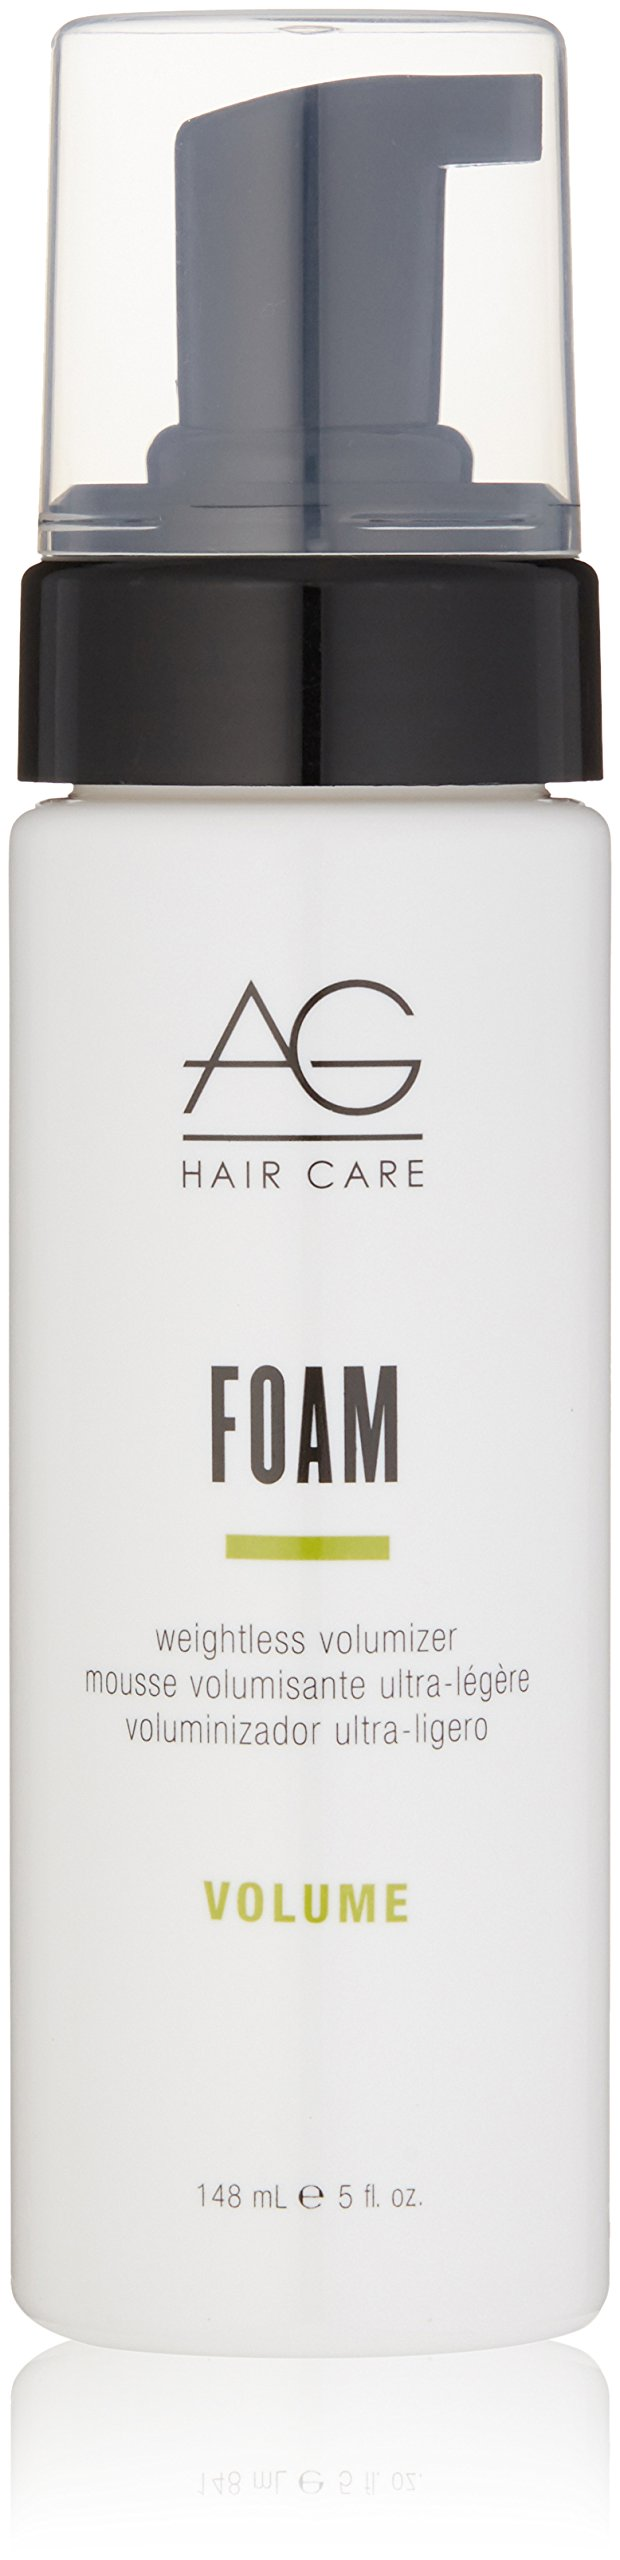 AG Hair Volume Foam Weightless Volumizer 5 fl. oz.